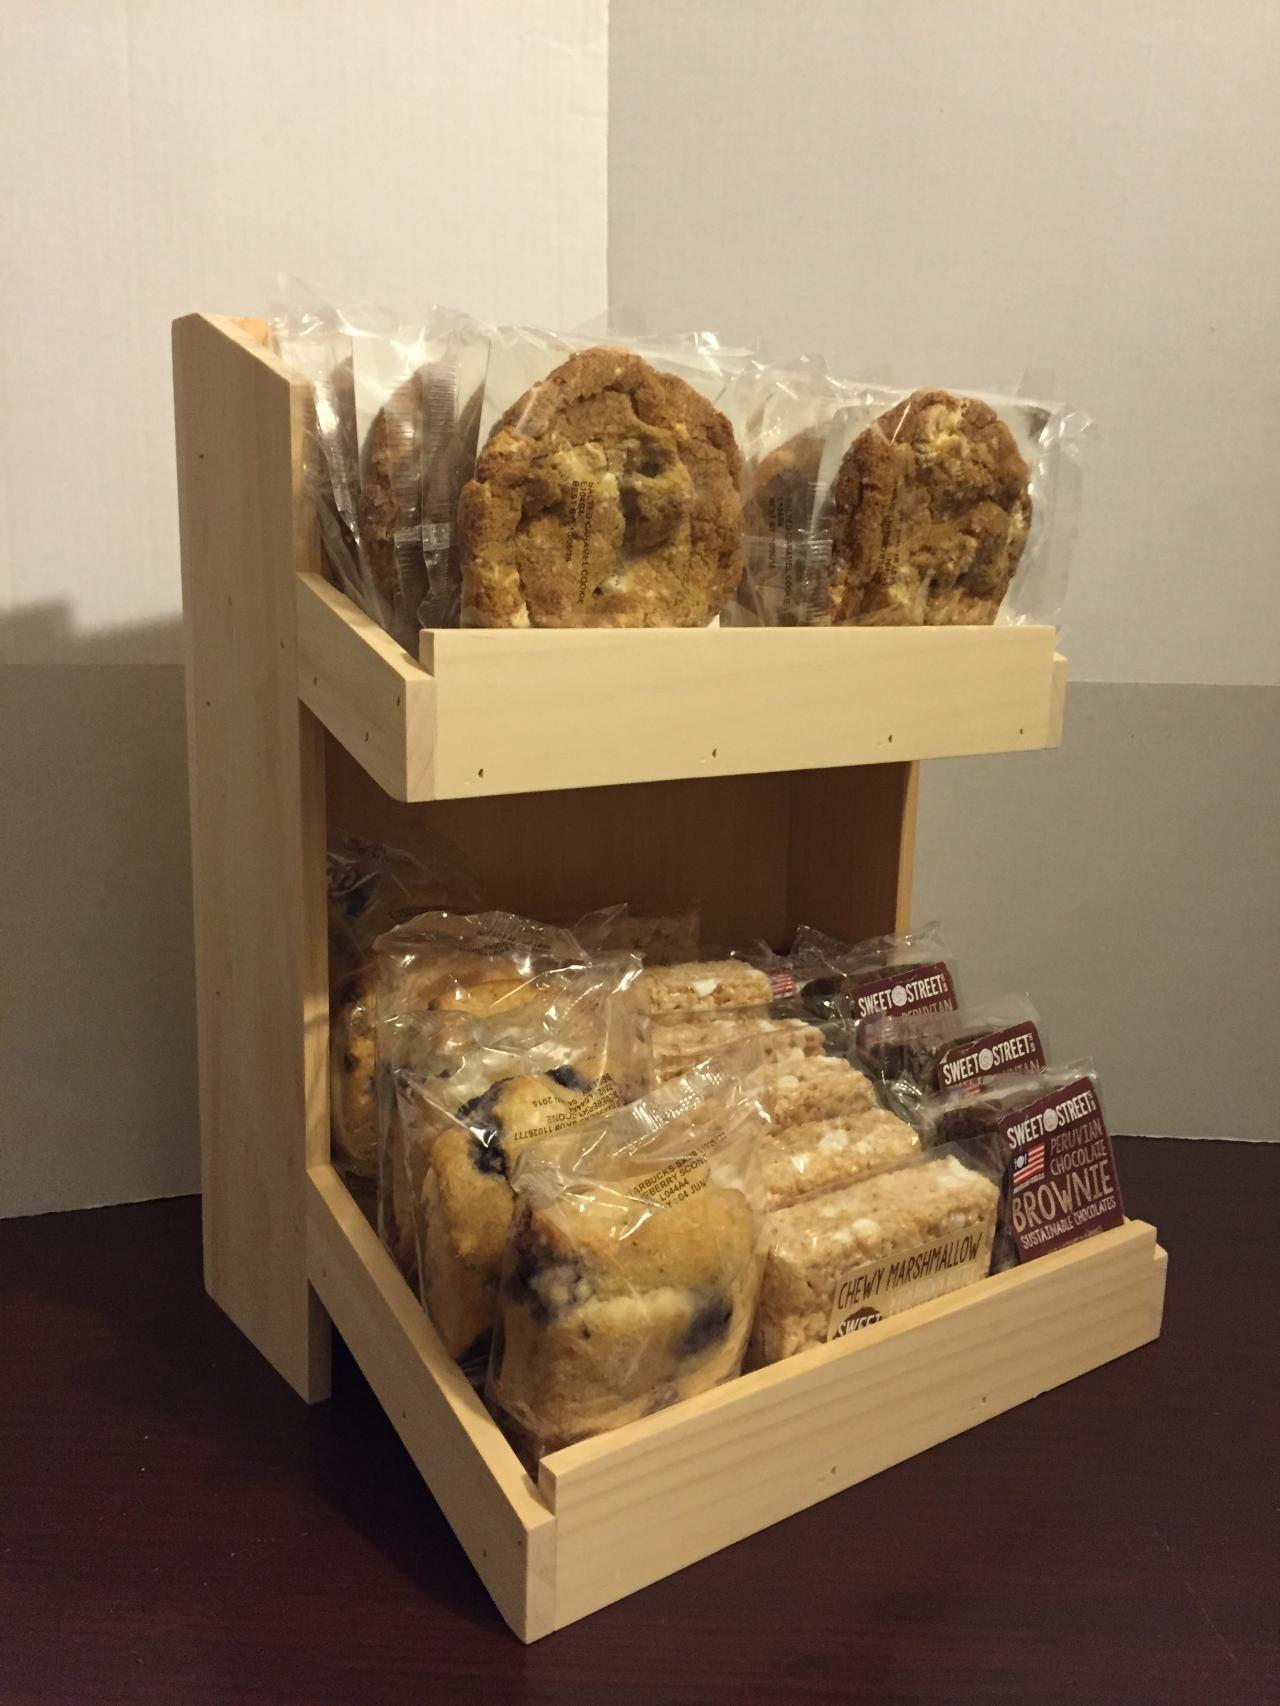 Rustic Wood Retail Store Product Display Fixtures Shelving Rustic Wood Countertop Pop Displays Wood Packaging Diy Food Display Bakery Decor Food Display